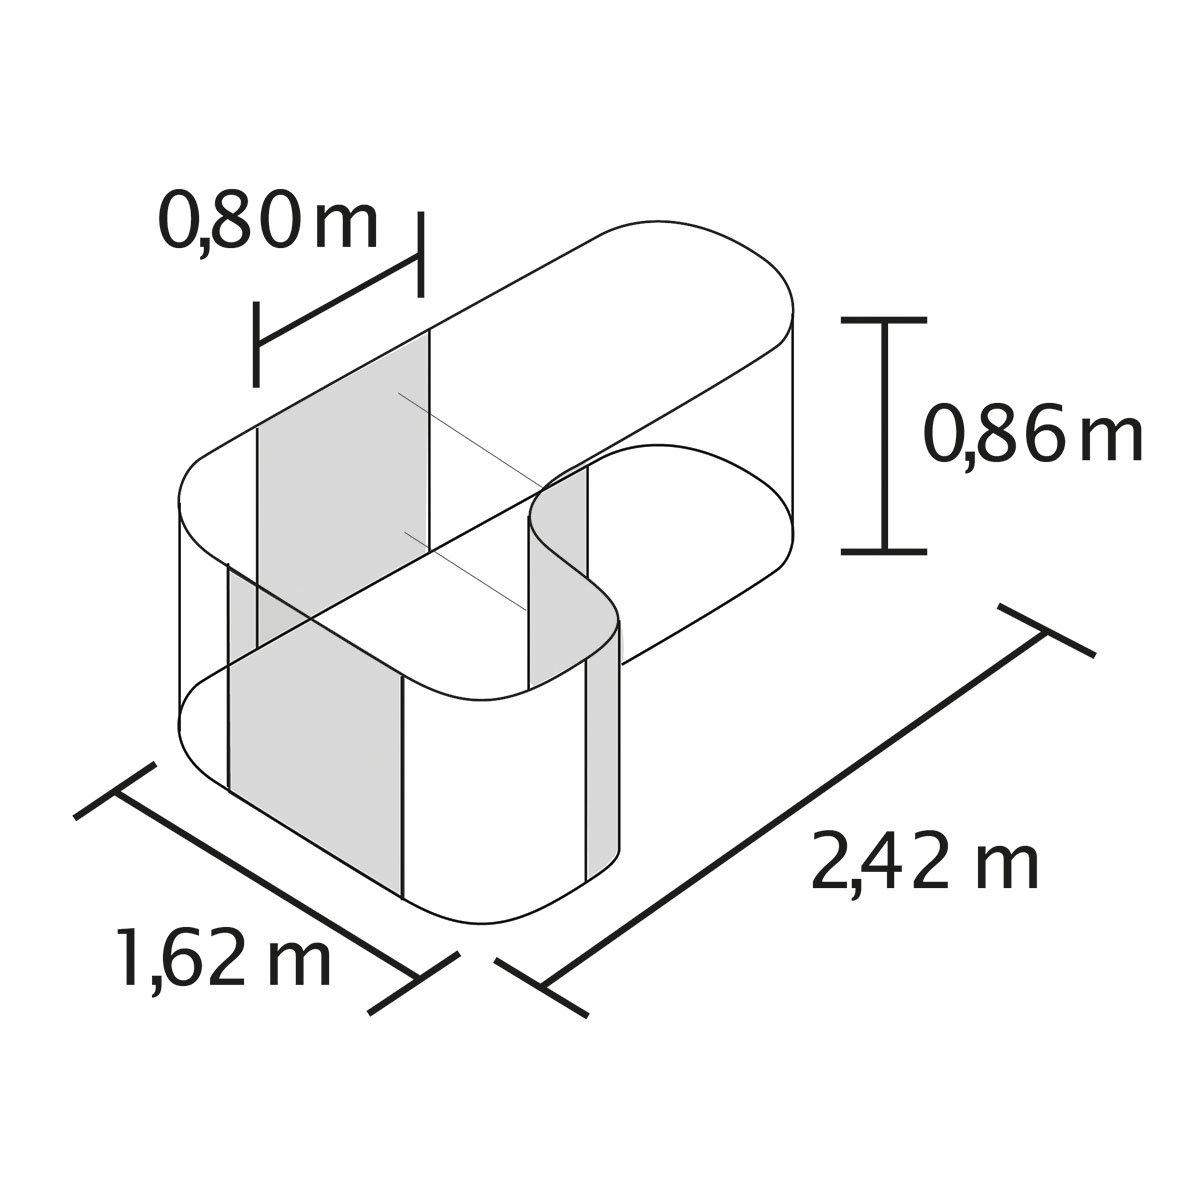 Vitavia Hochbeet Erweiterung Curve Aluminium Rot 80x80x86 Cm